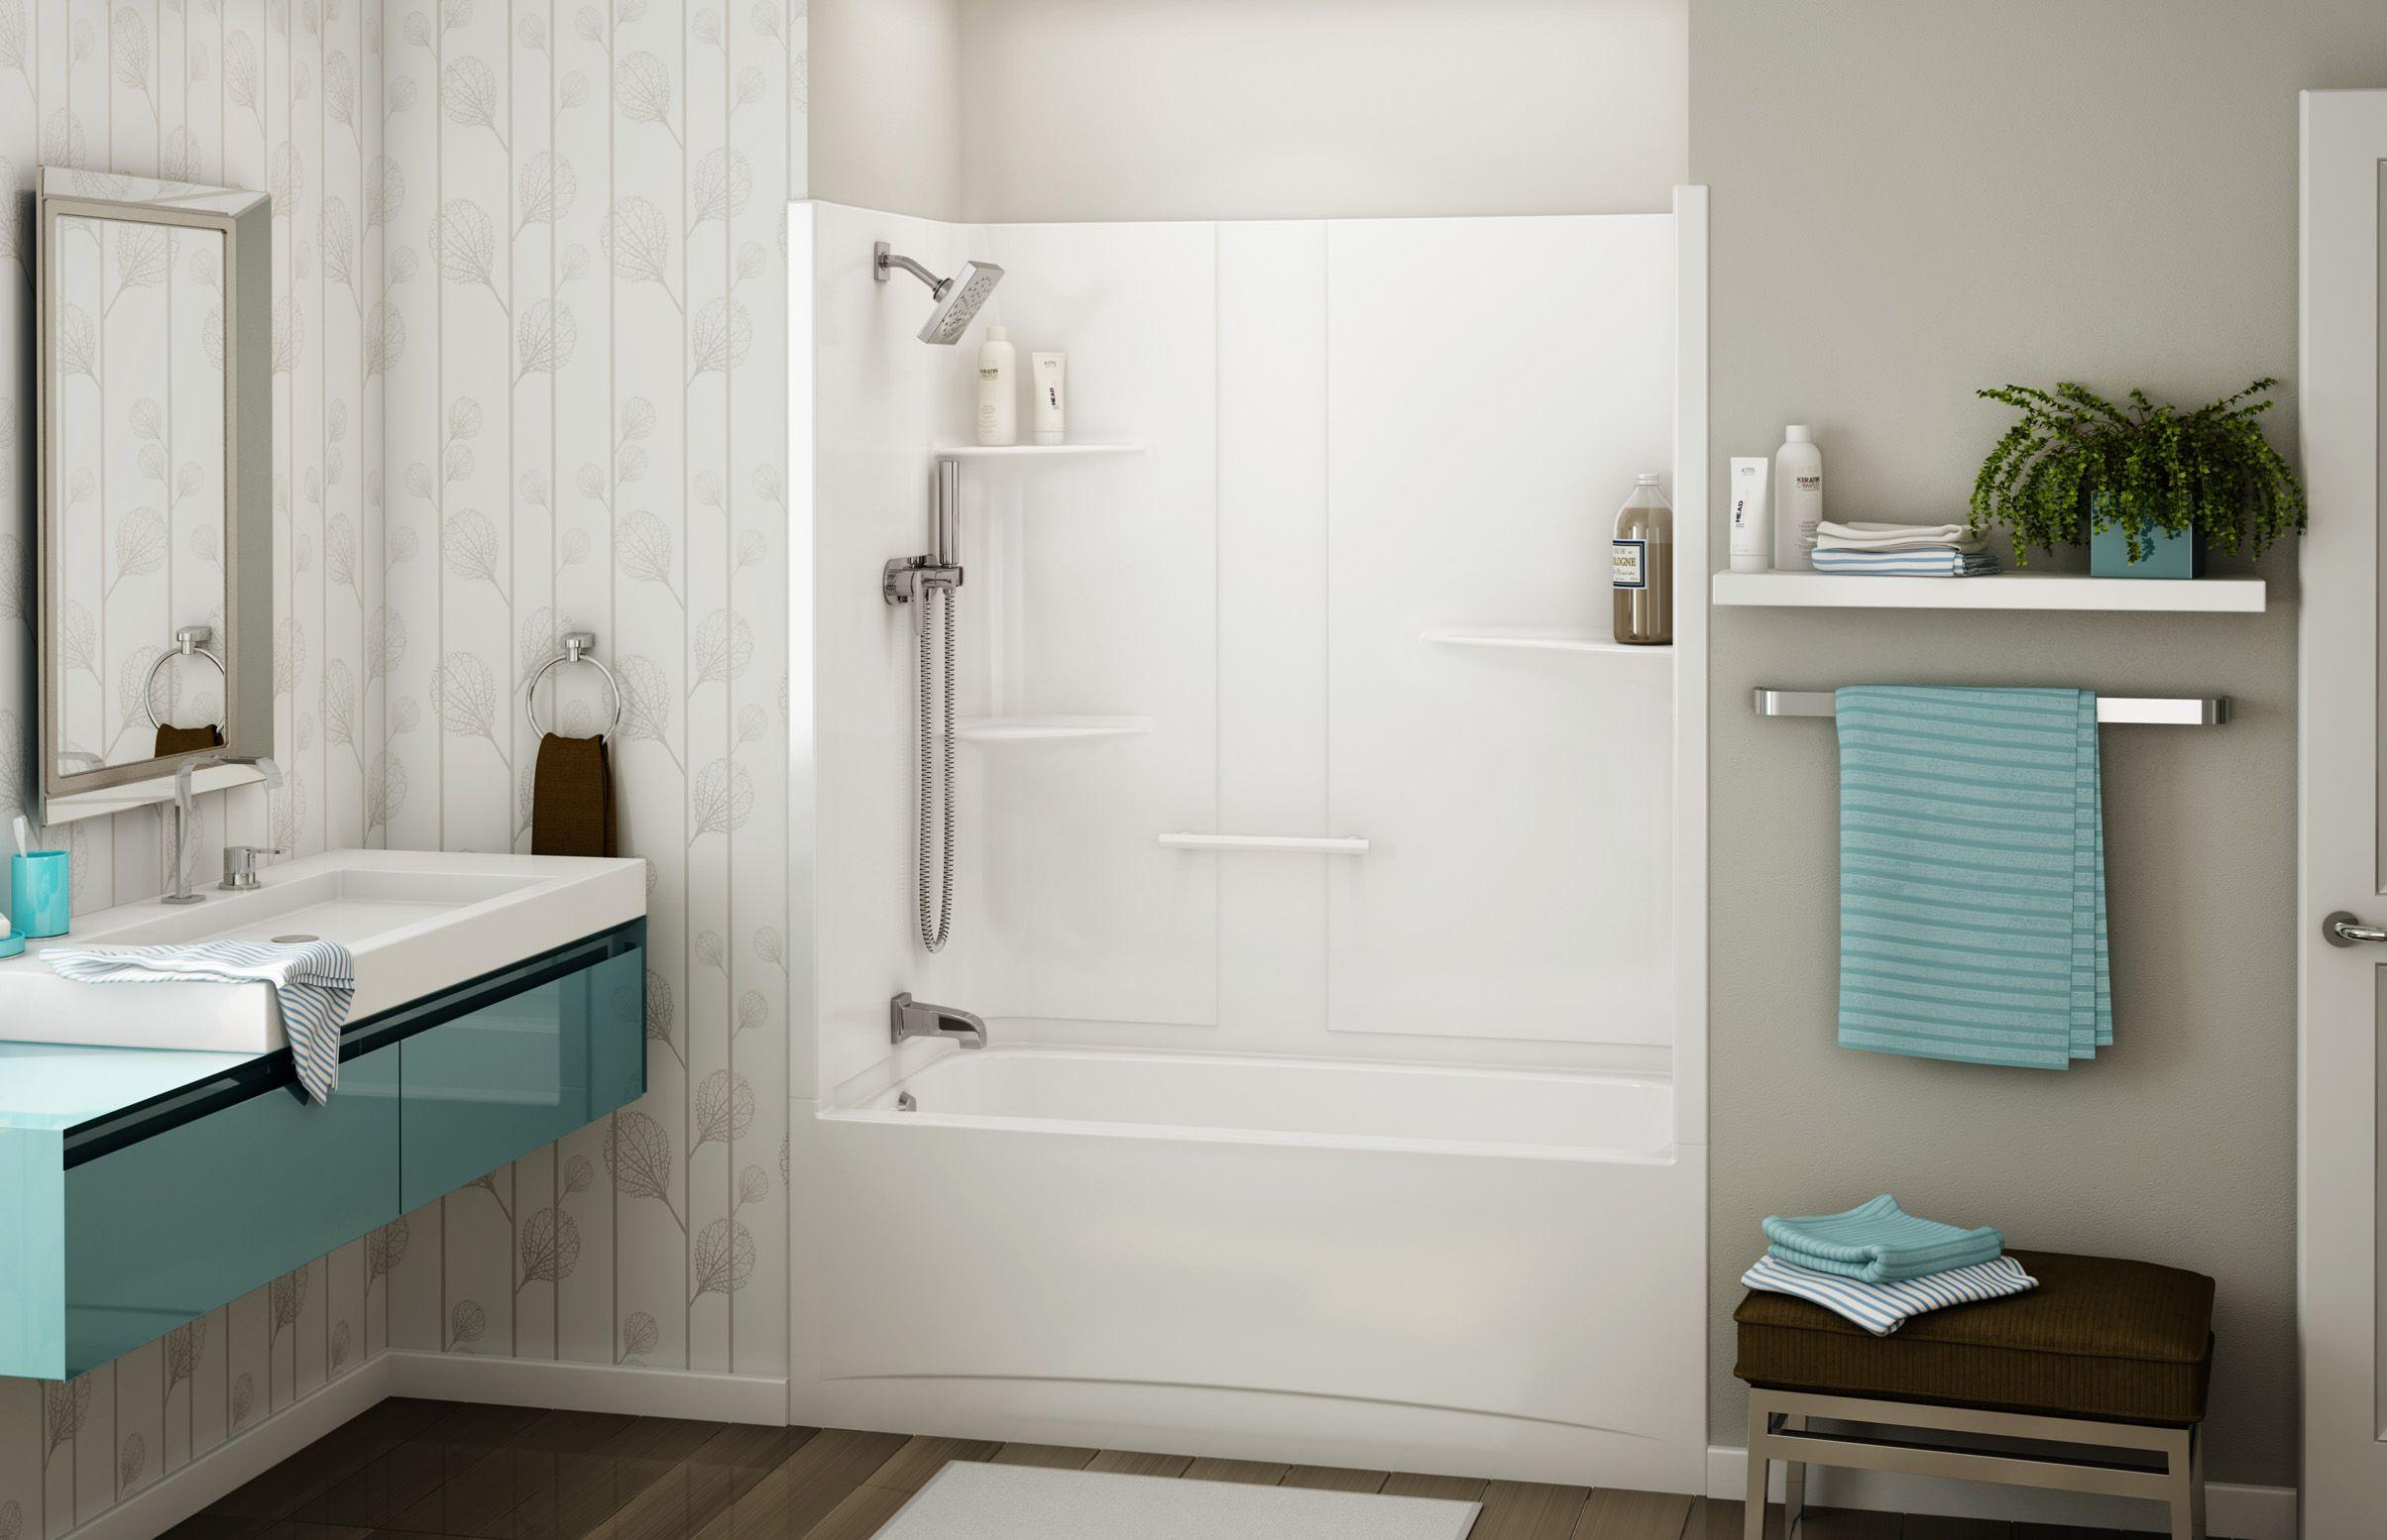 ALLIA TS-6032 Alcove or Tub showers bathtub - MAAX Professional ...